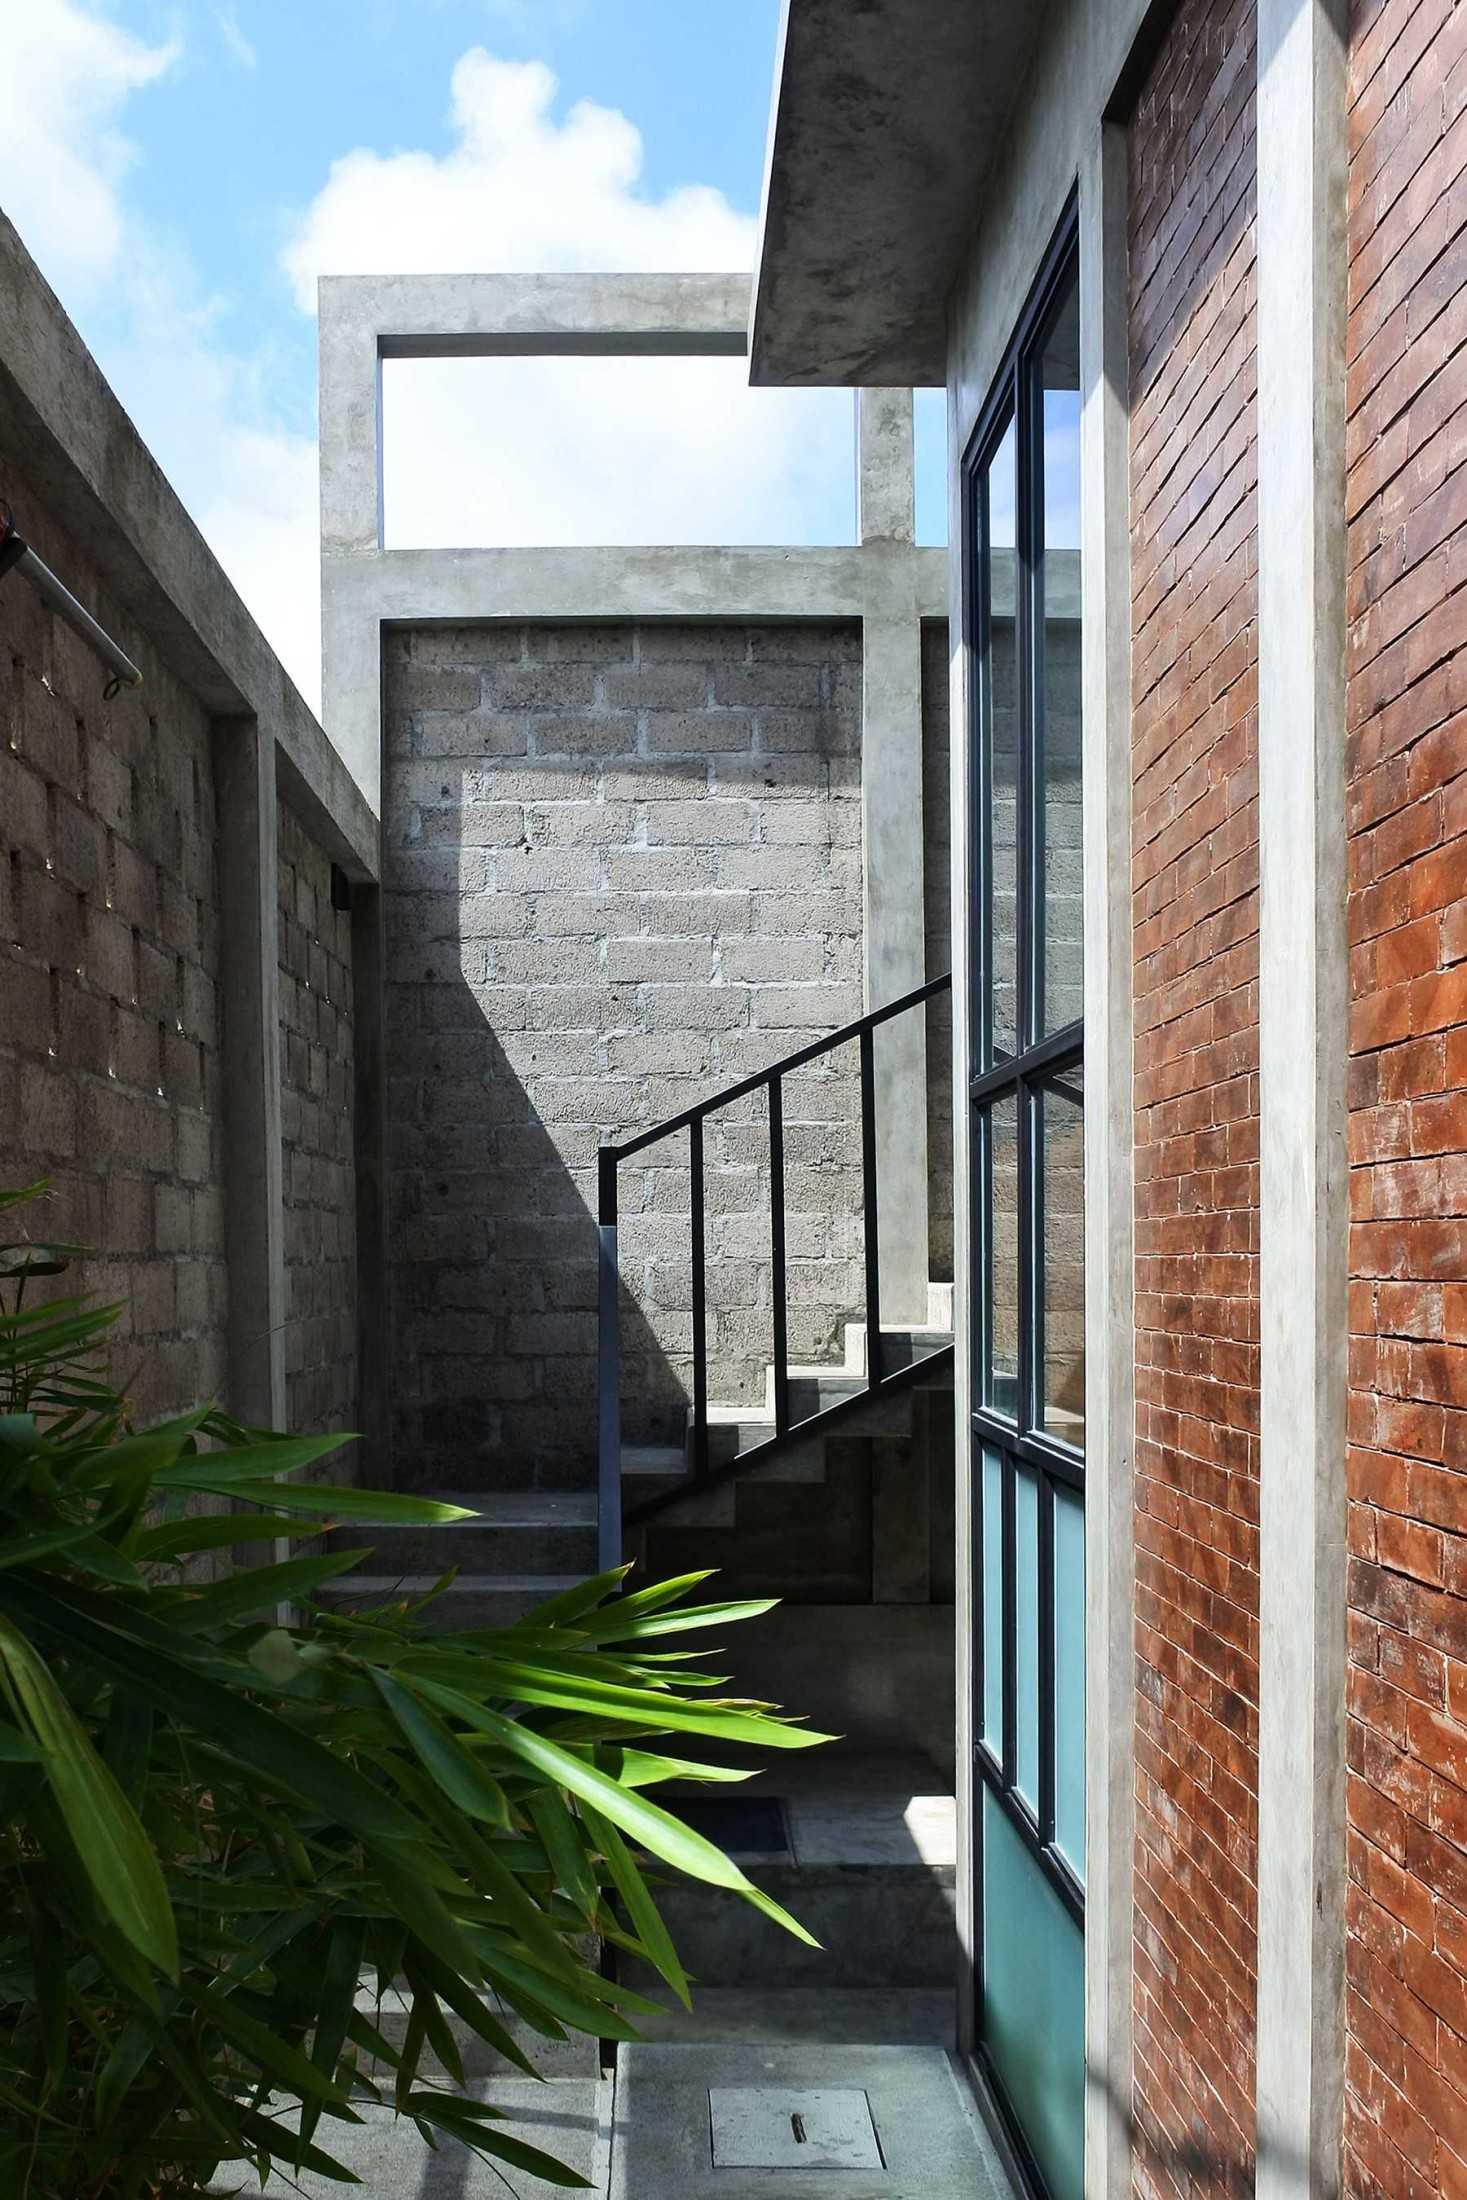 Bentara Indonesia Arsitek Rumah Uluwatu Bali, Indonesia Bali, Indonesia Bentara-Indonesia-Arsitek-Rumah-Uluwatu  65916